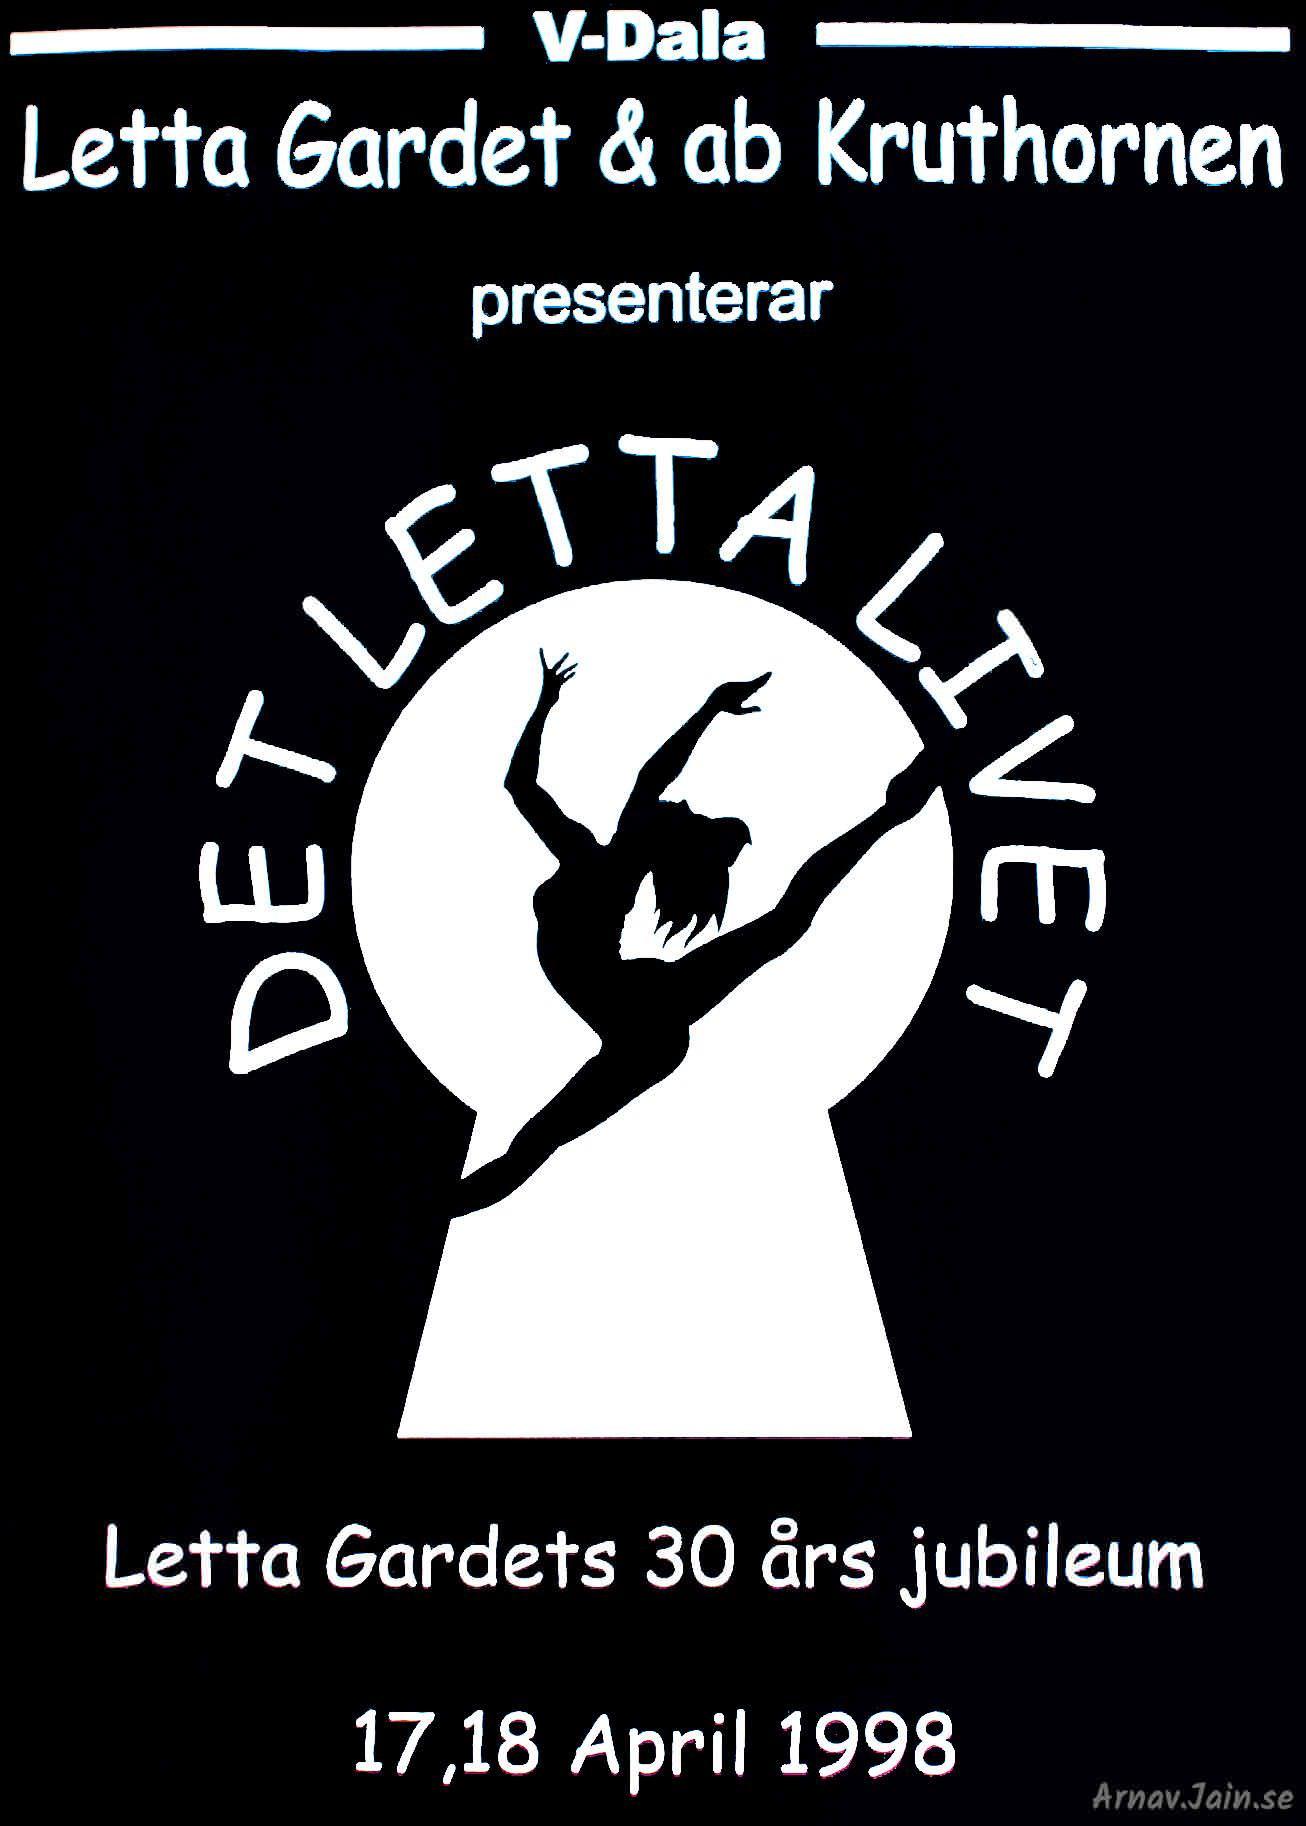 Affisch Letta Gardet 30 år